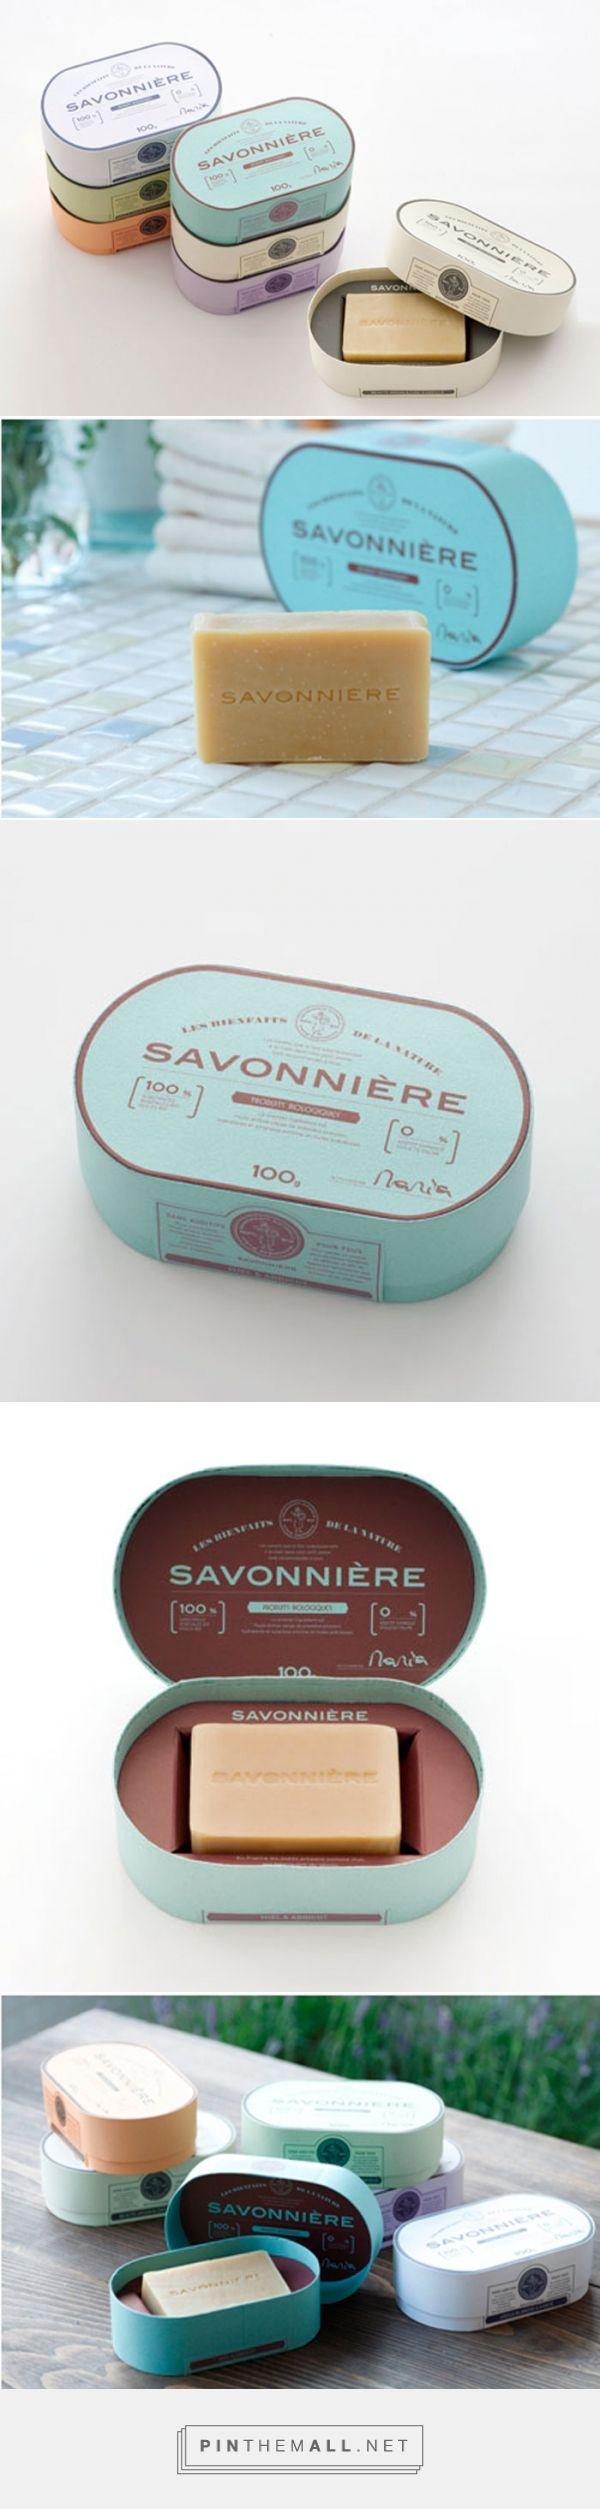 ¿Latas de conserva? #packaging #brandgourmet